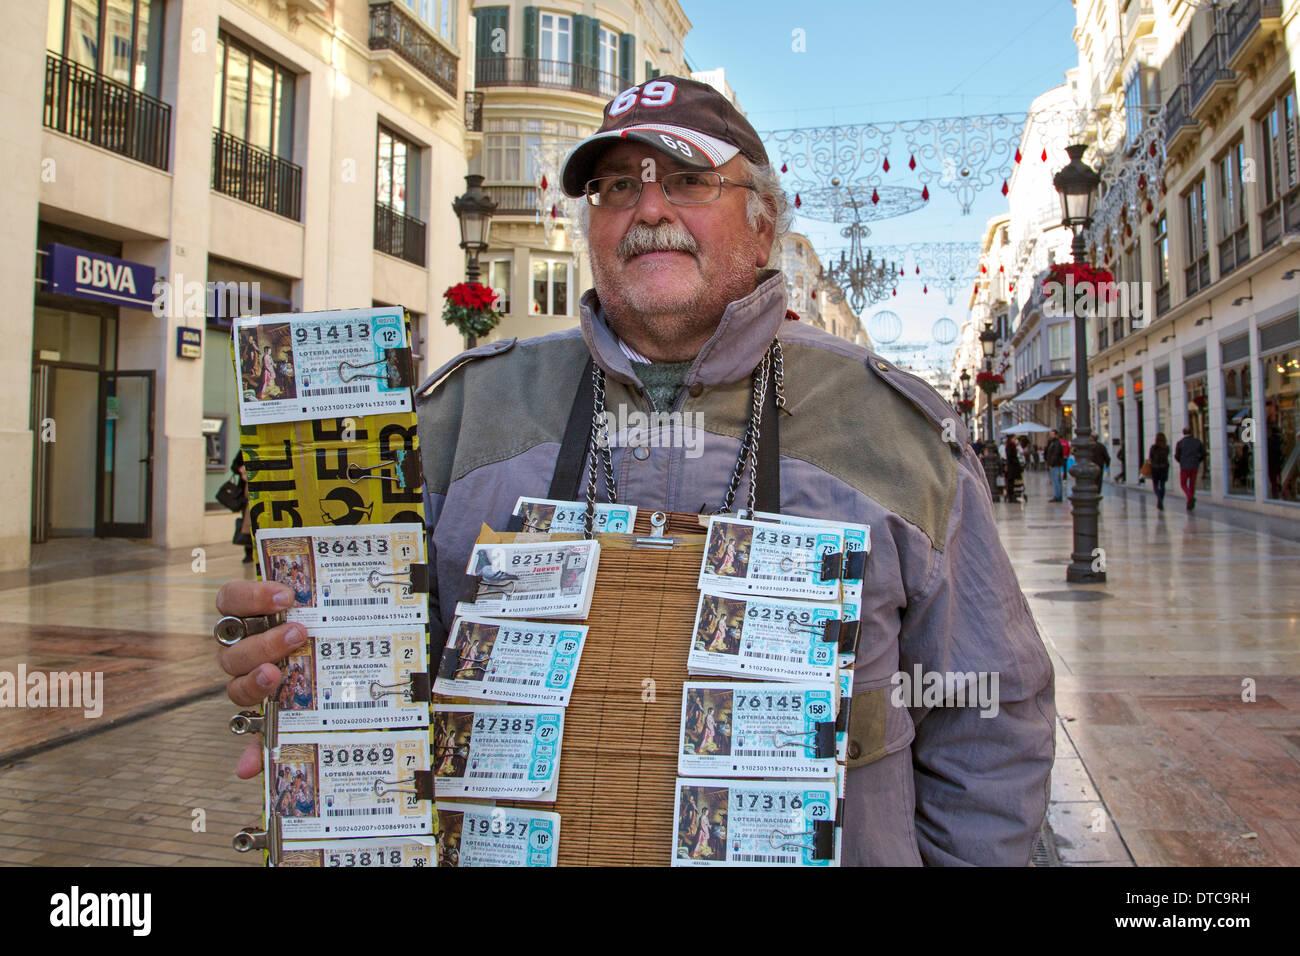 Lottery vendor selling Christmas lottery Calle Larios Malaga Andalusia Spain lotero loteria de navidad andalucia españa - Stock Image